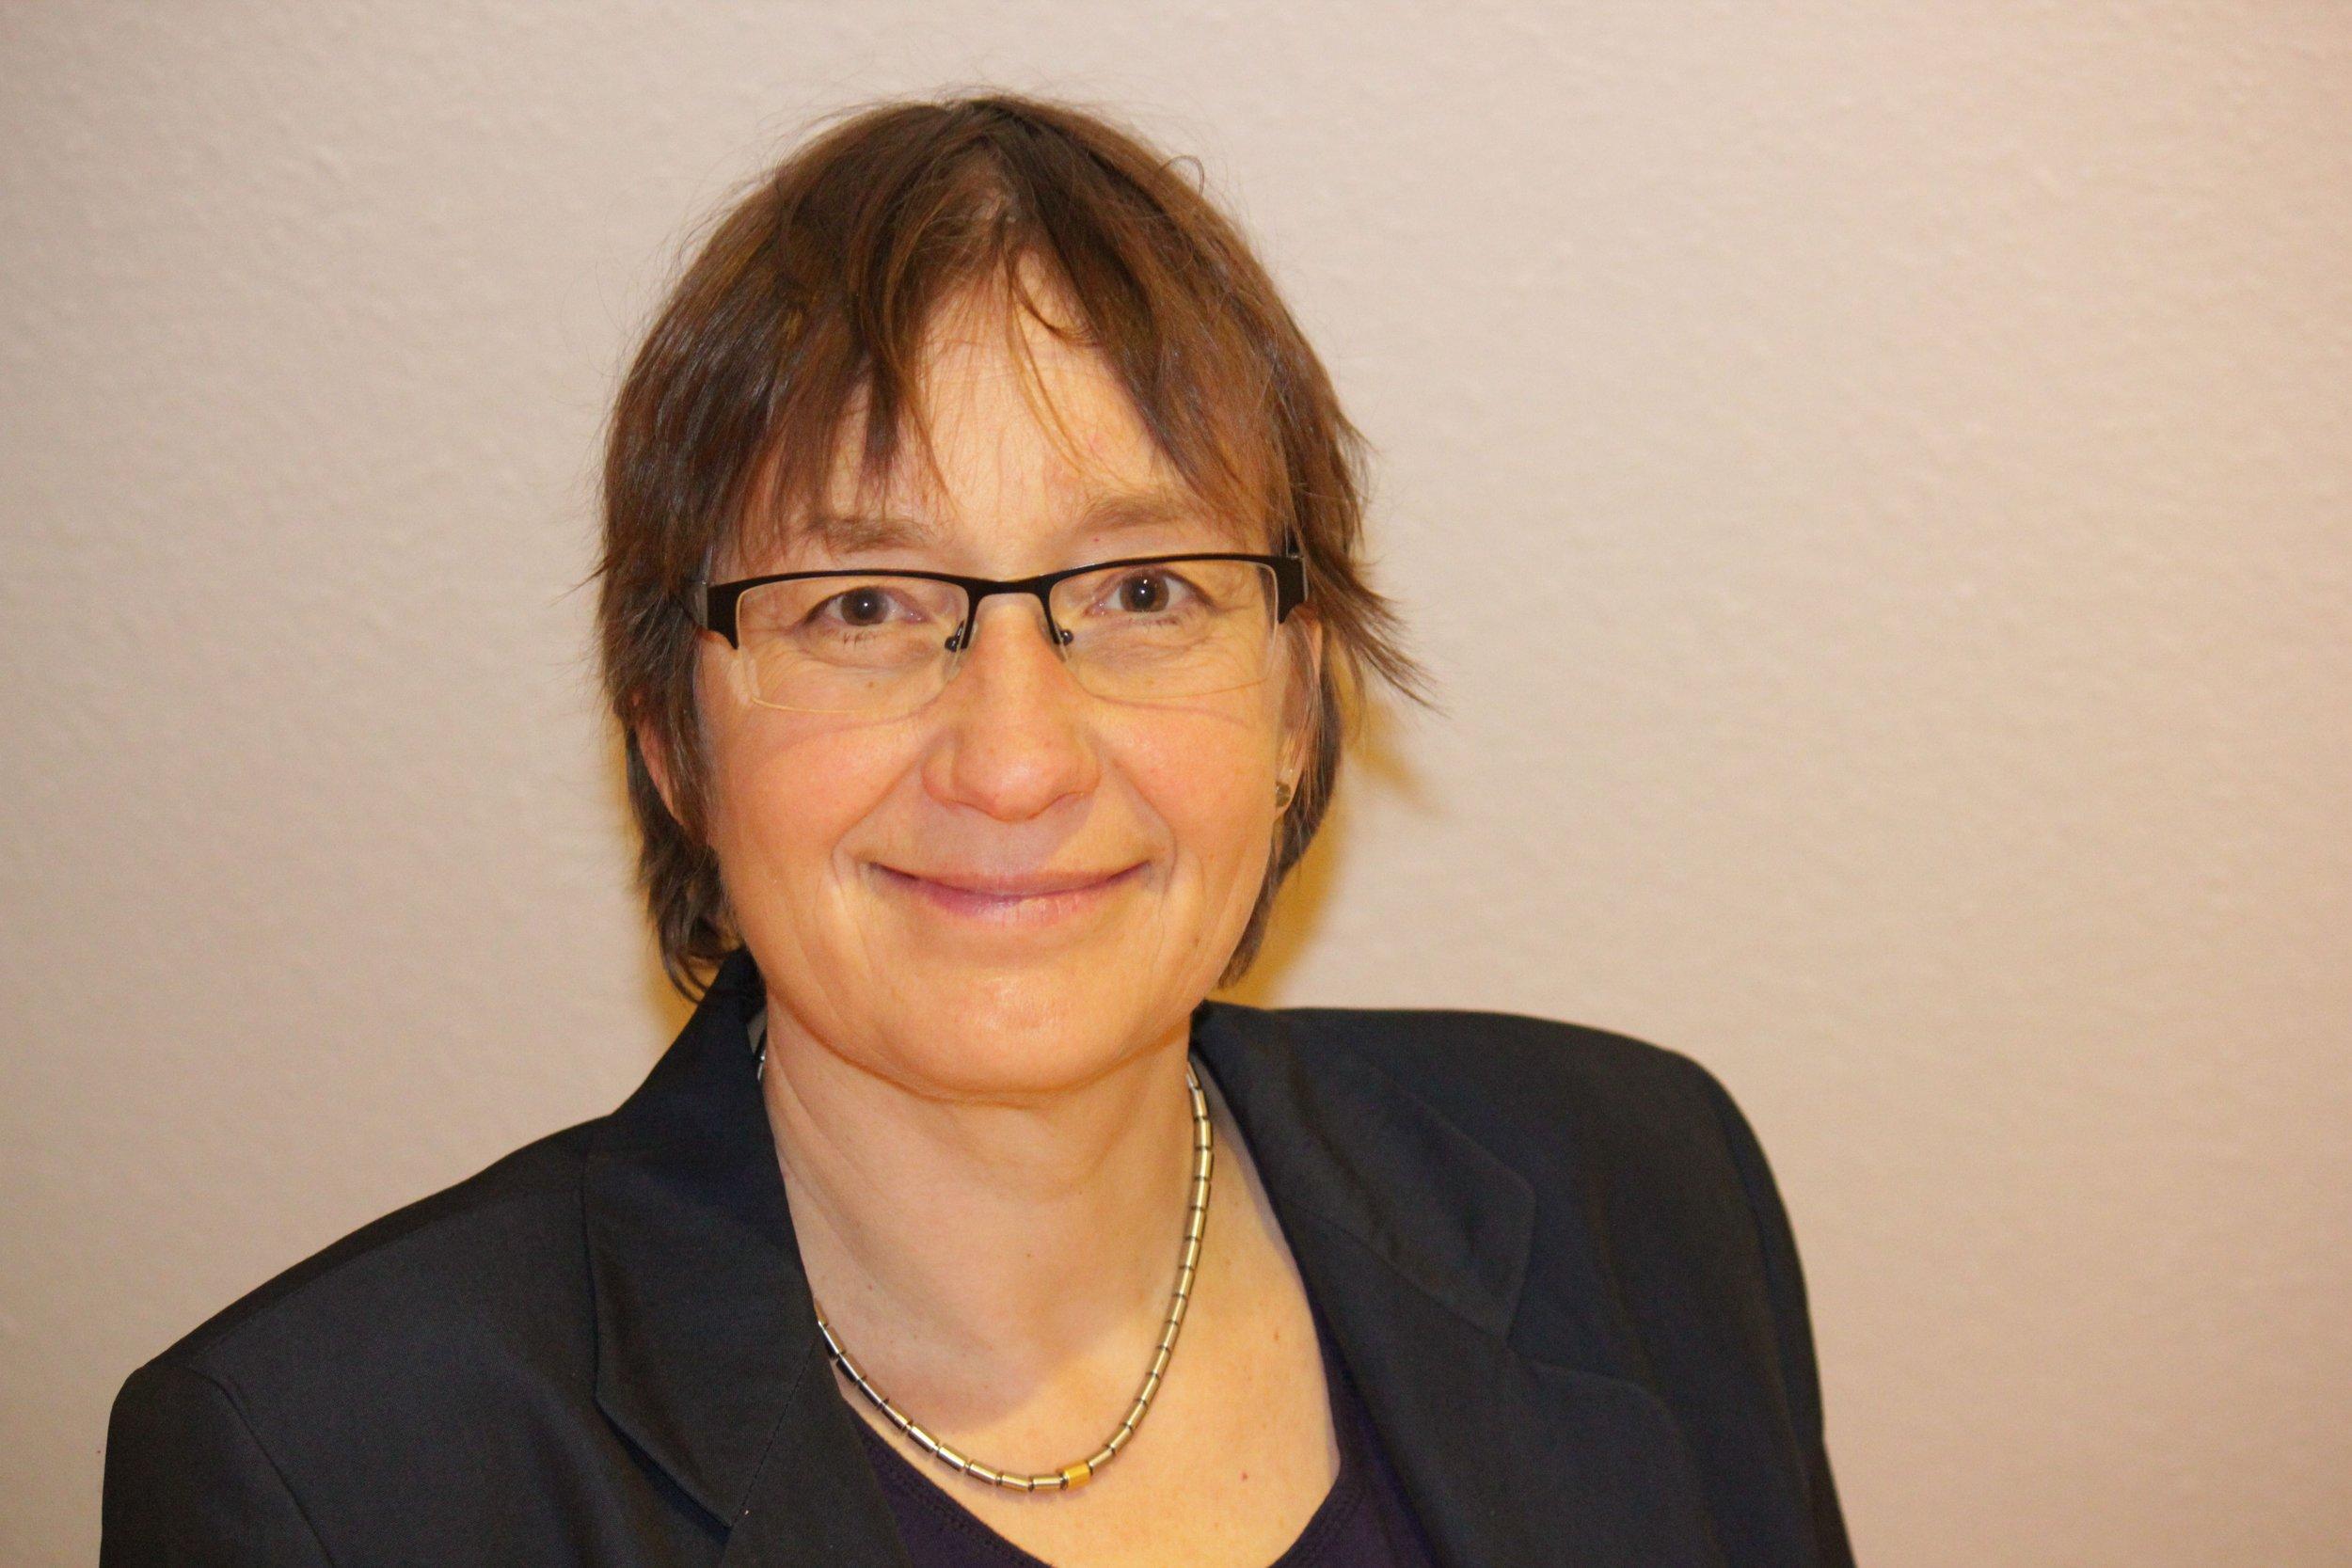 Urban geographer and gender expert, prof. Brigitte Wotha, Ostfalia University of Applied Sciences, photo (c) Brigitte Wotha